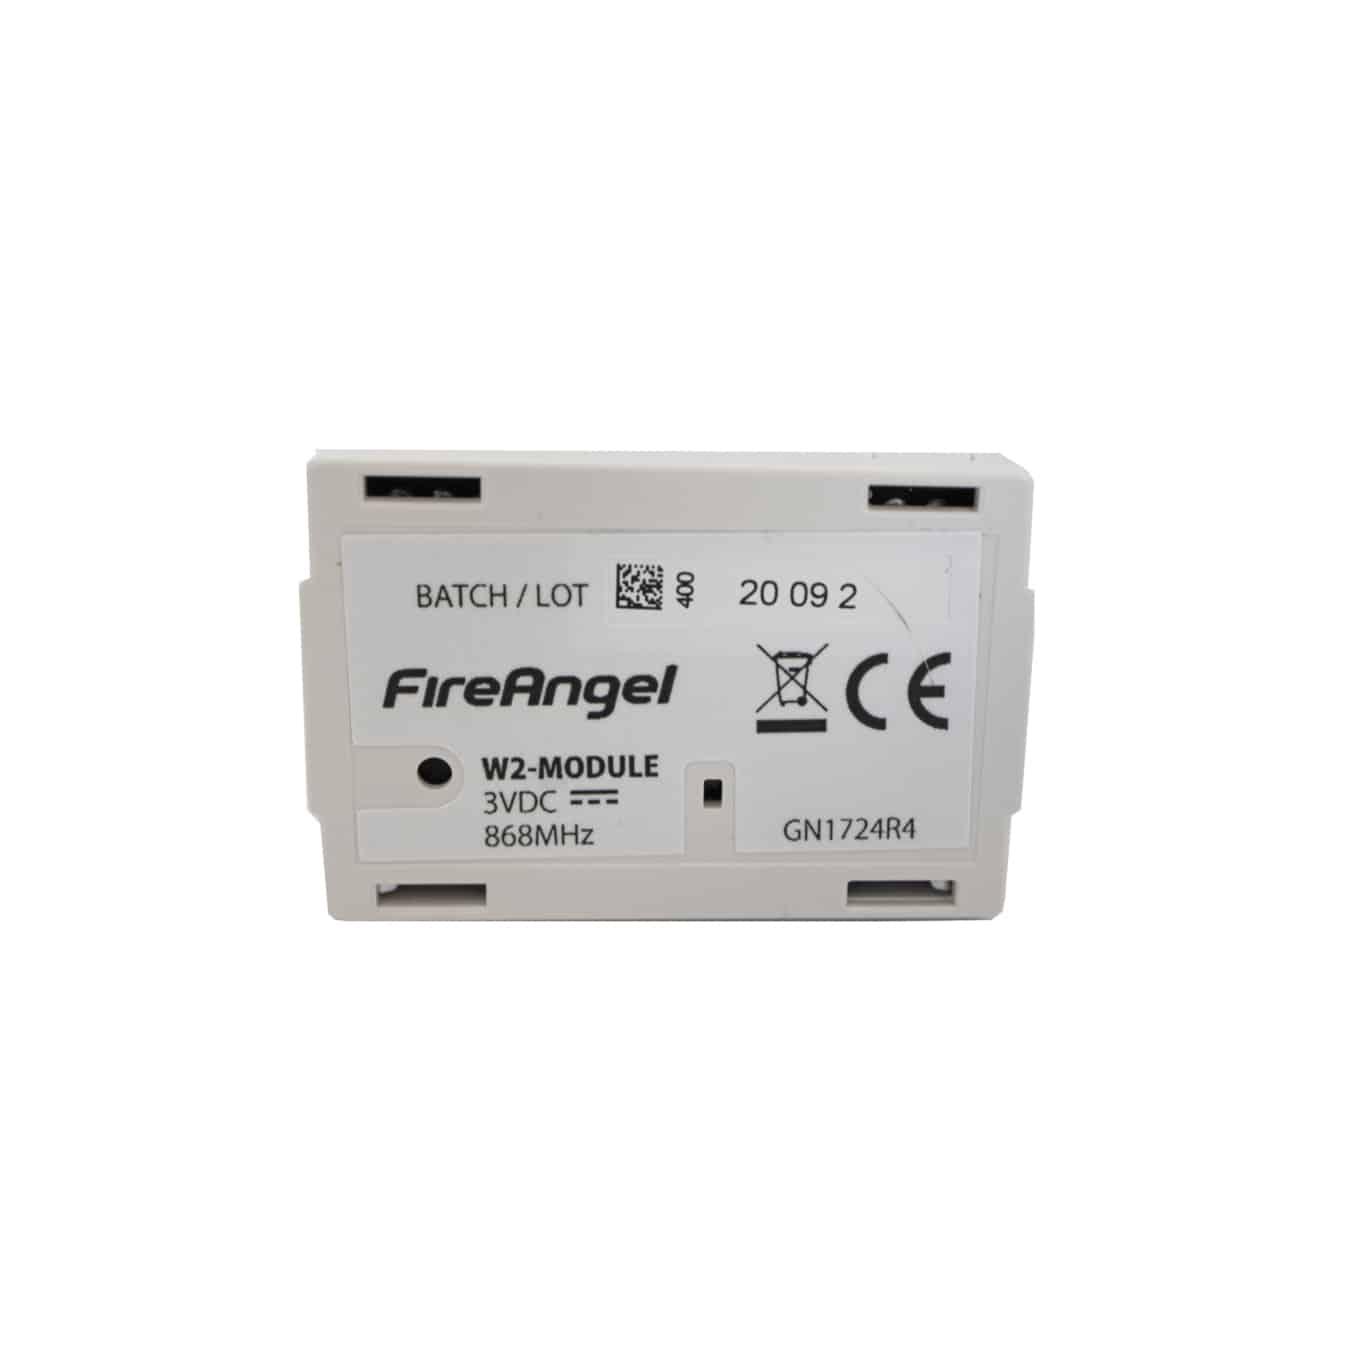 Koop Wi-Safe2 W2-module - draadloos koppelbaar